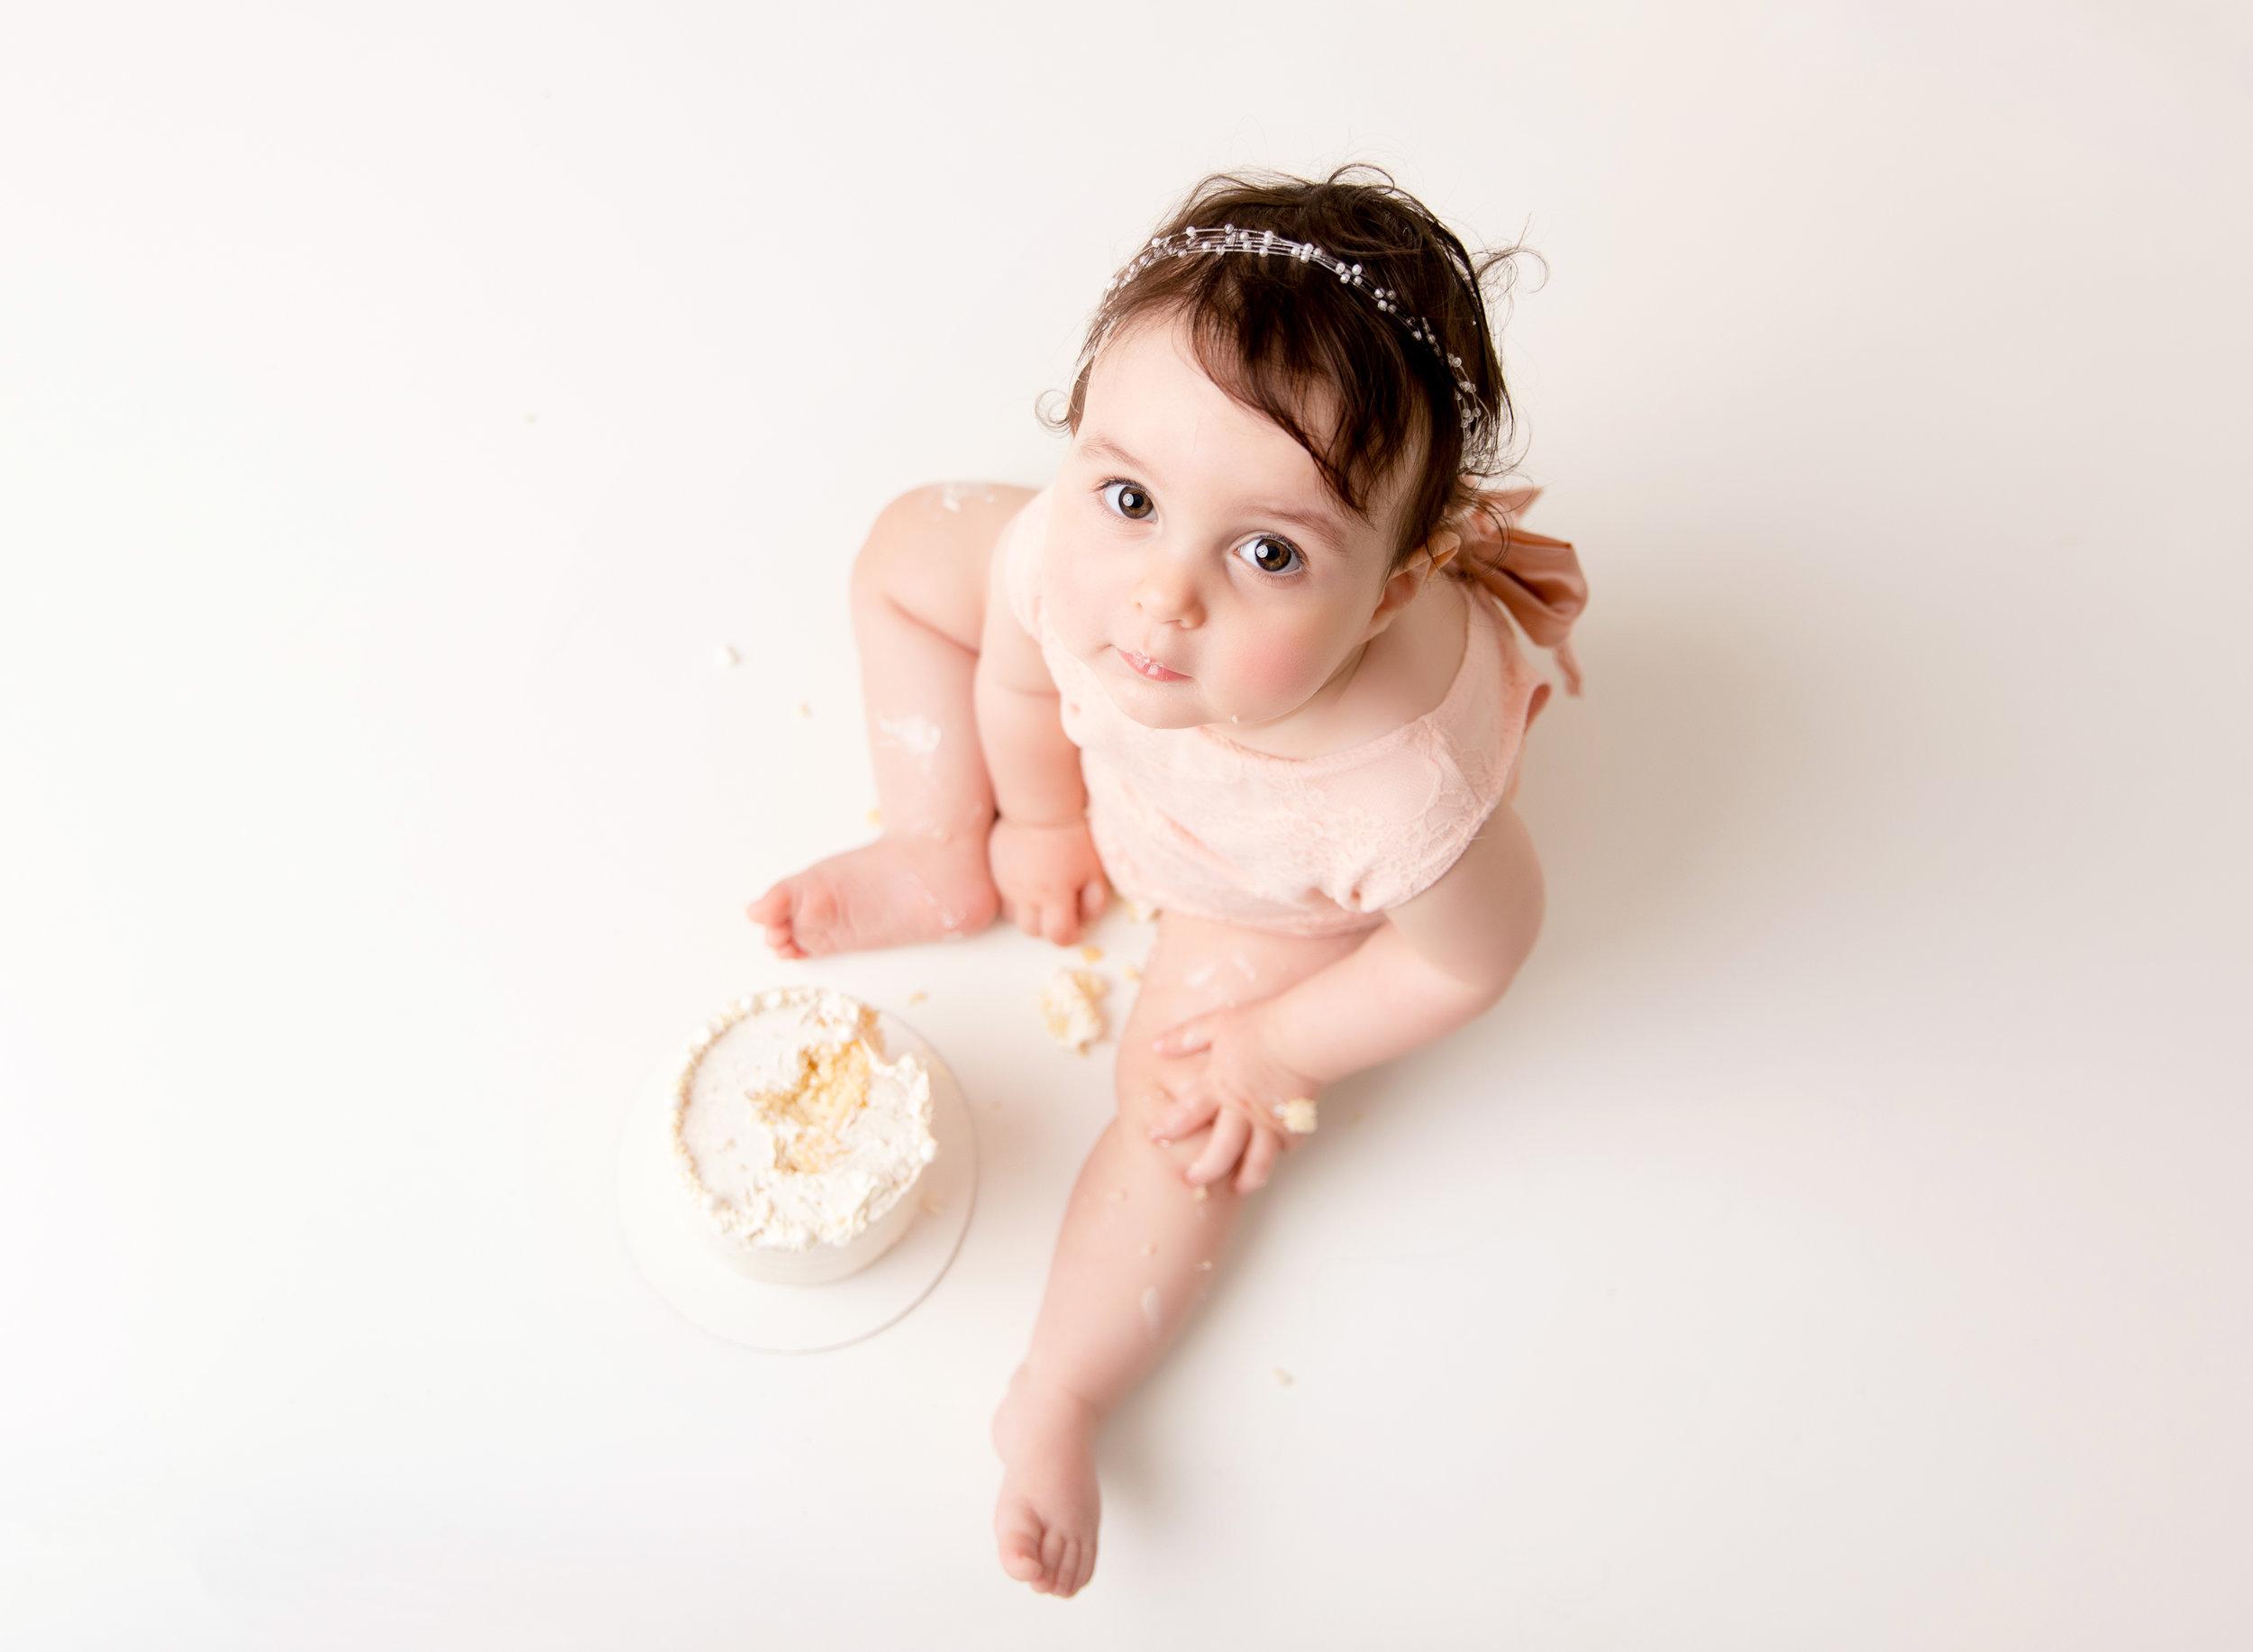 CakeSmashEliana16LucianaGolcman.jpg